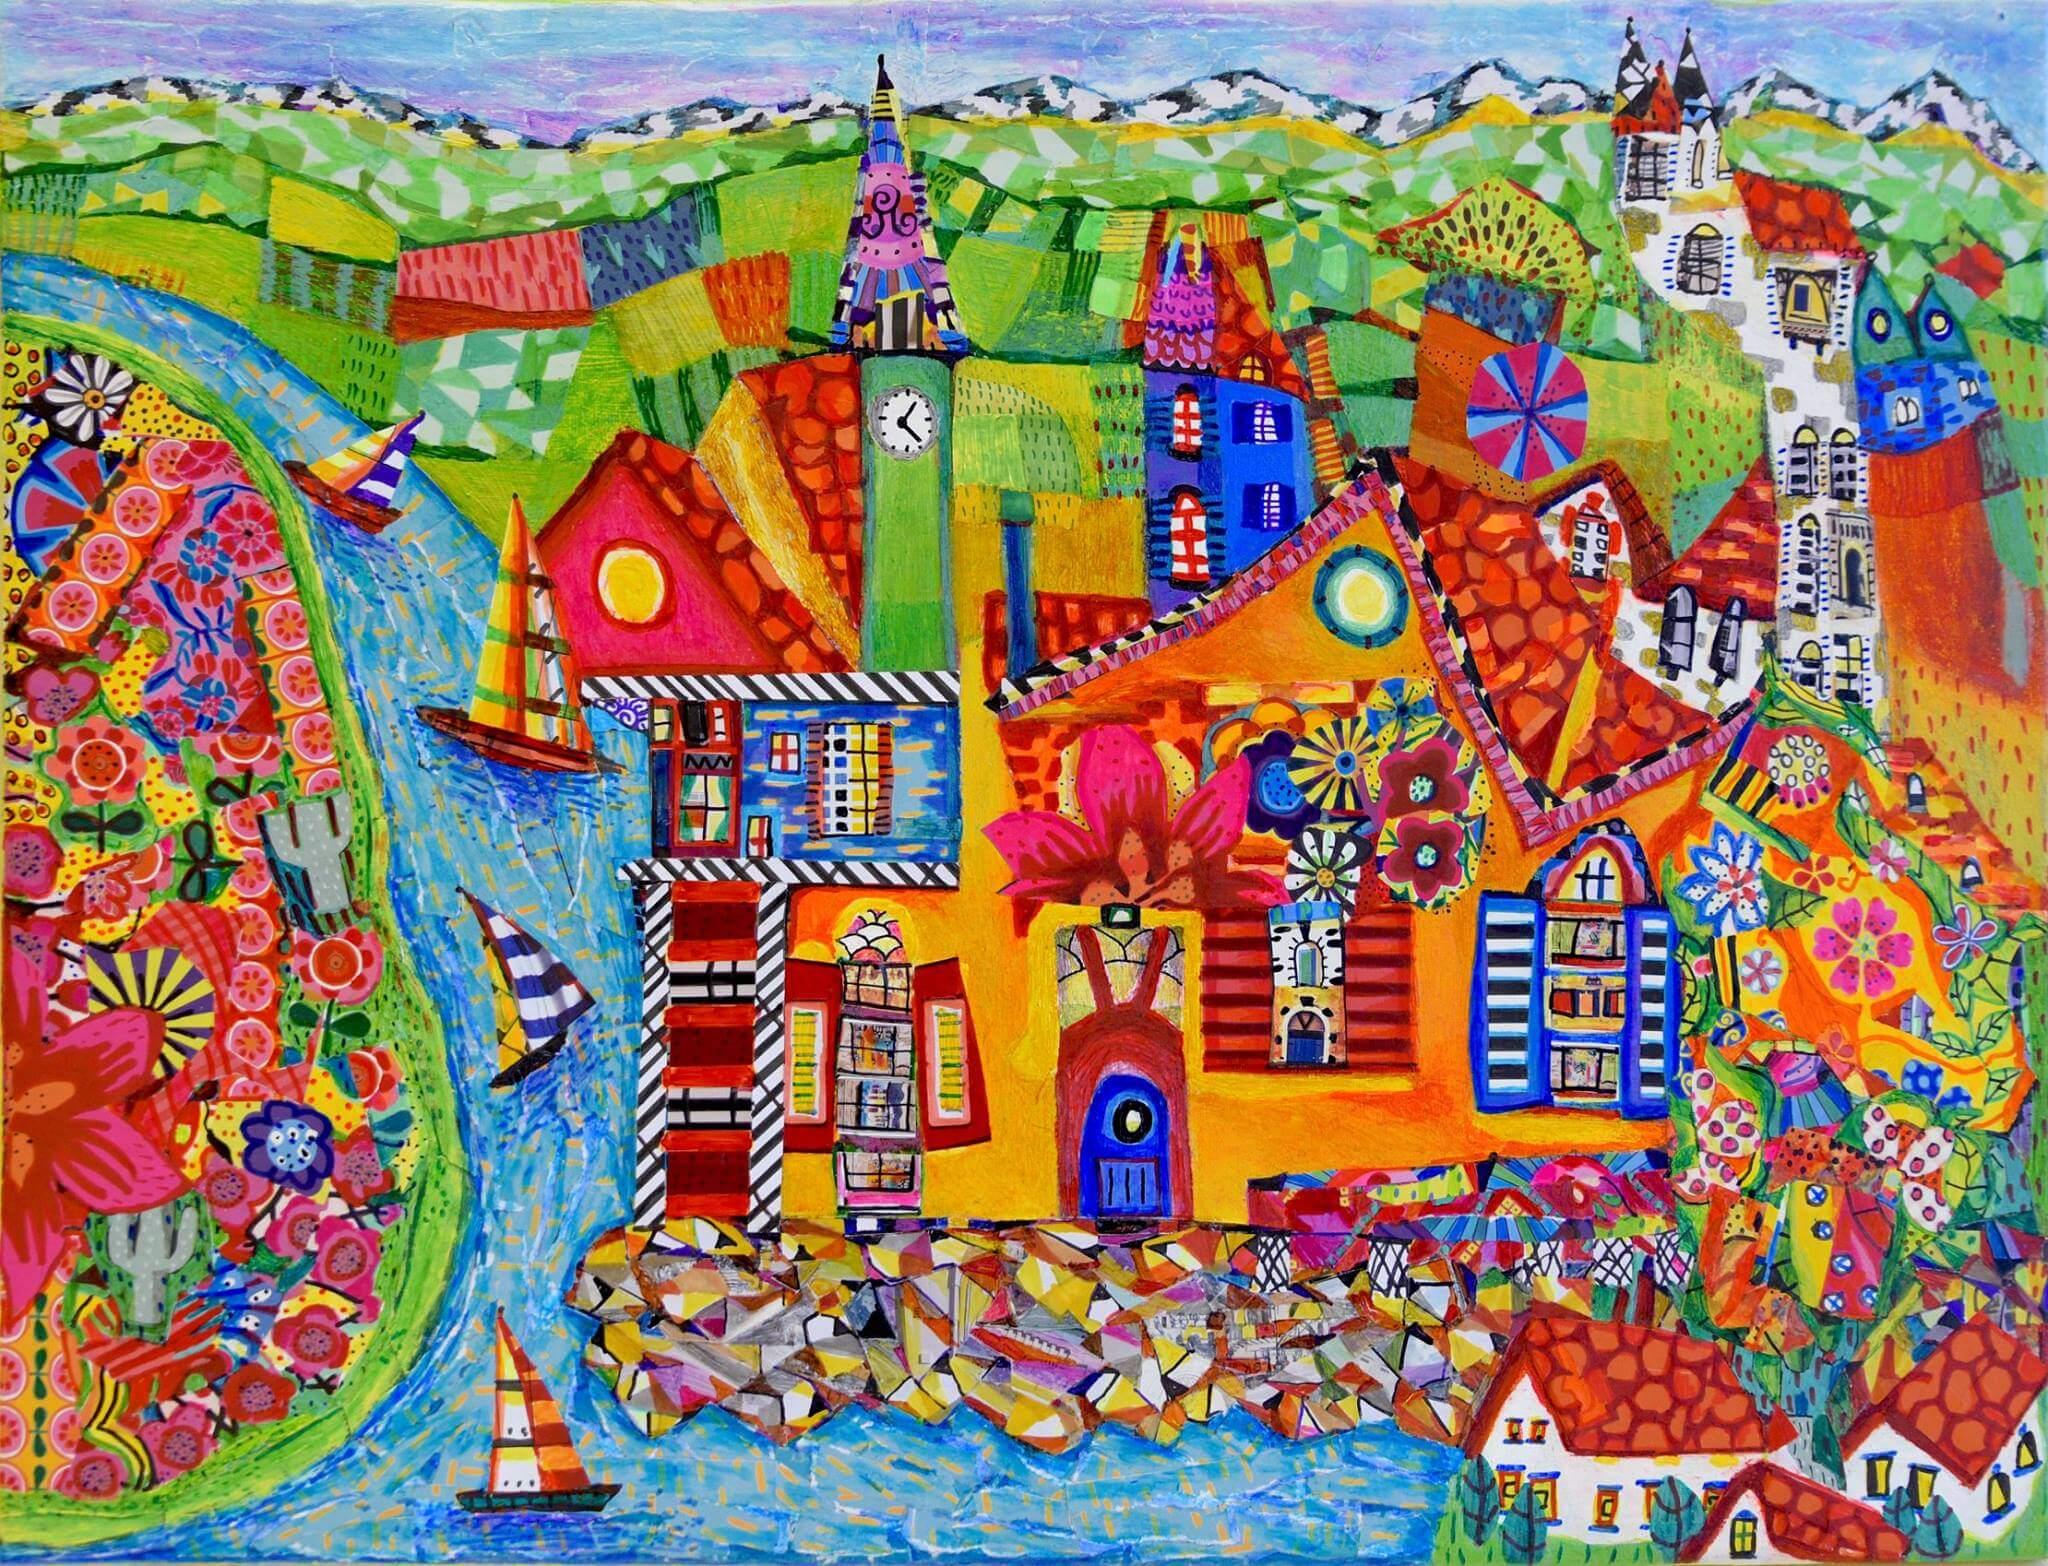 DANIEL MEAKIN, Quaint Coastal Village. £435.